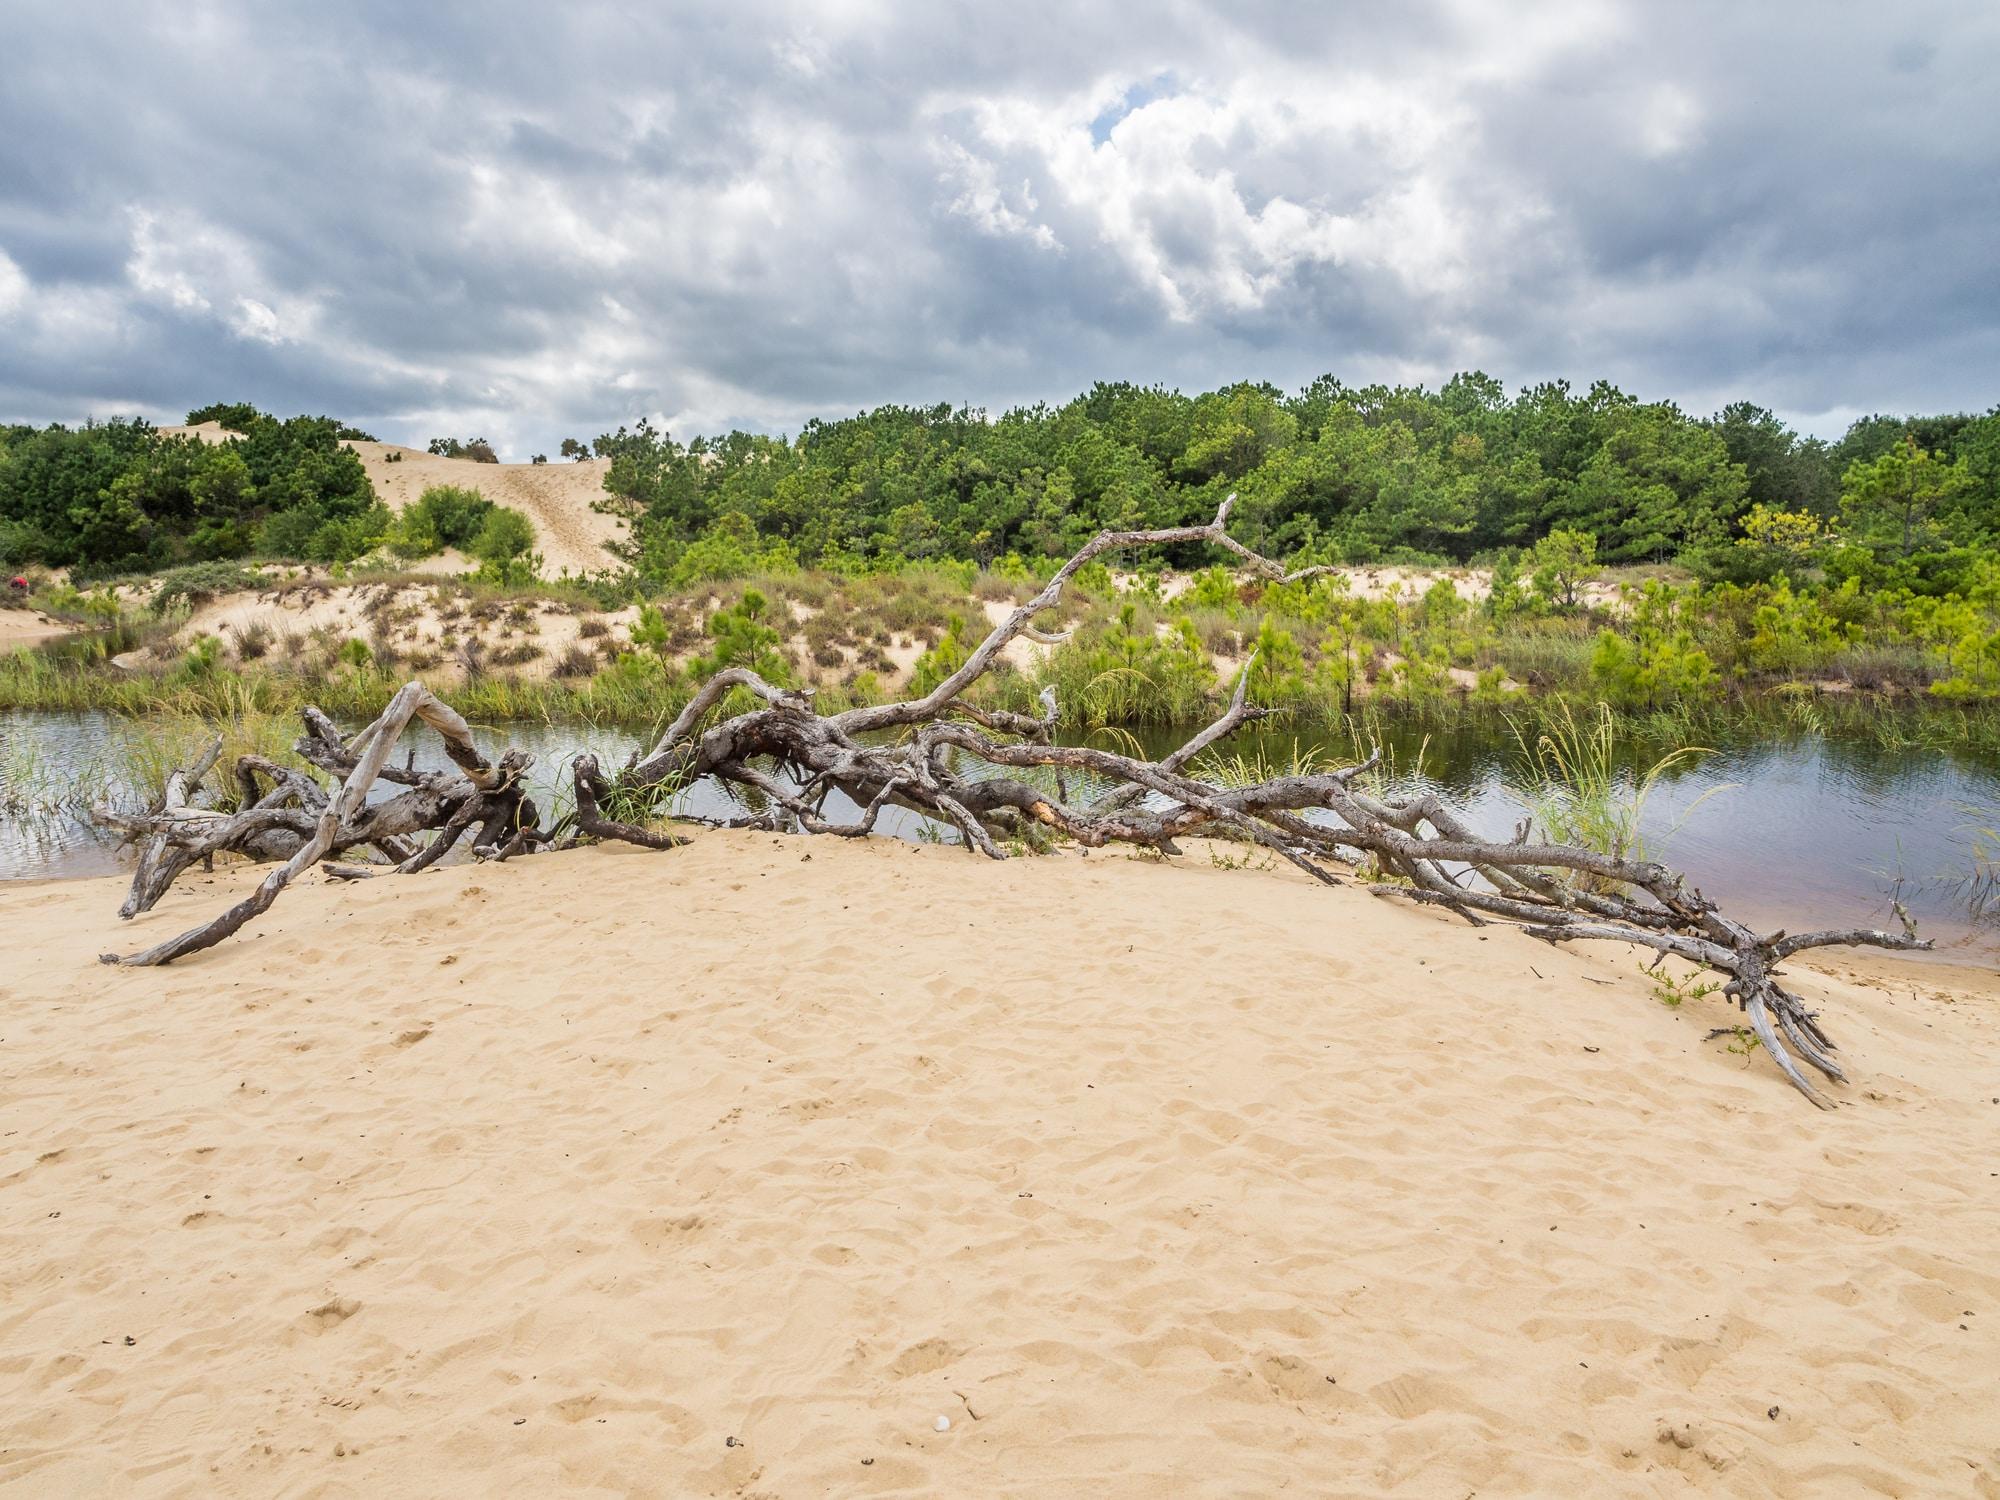 Landscape of Jockey's Ridge State Park: the tallest sand dunes at East Coast